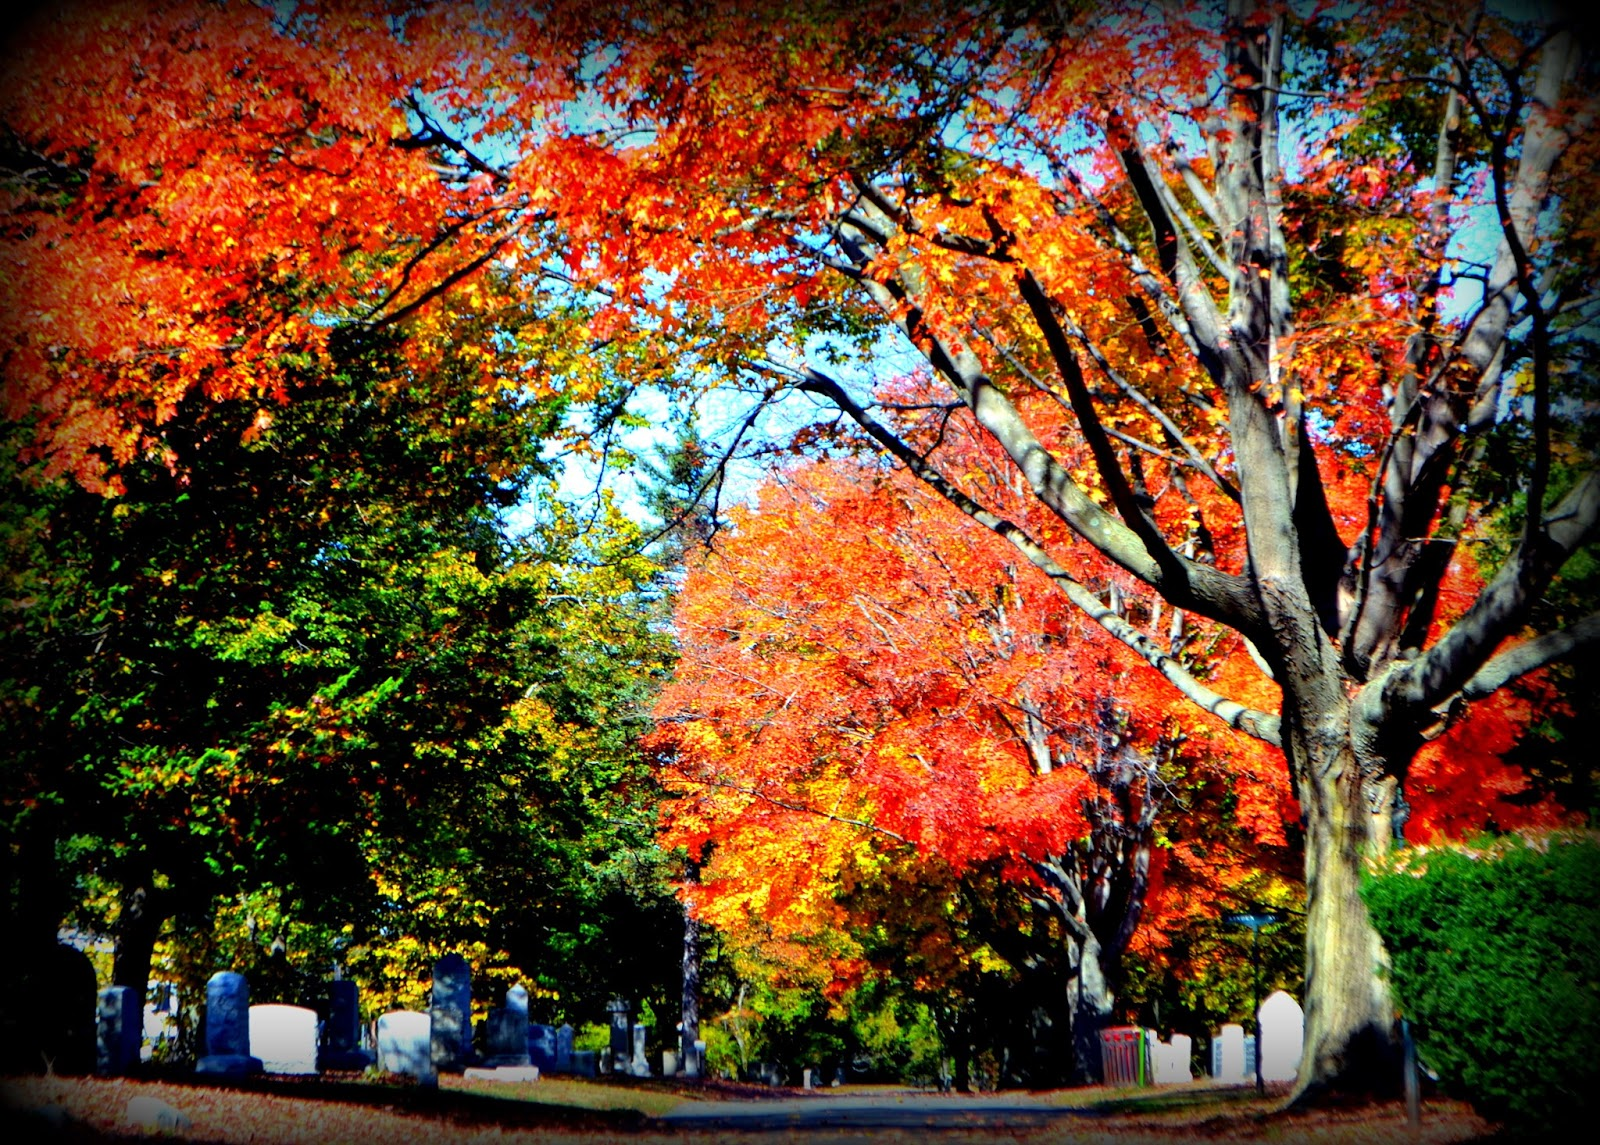 cemetery, fall foliage, autumn, leaves, color